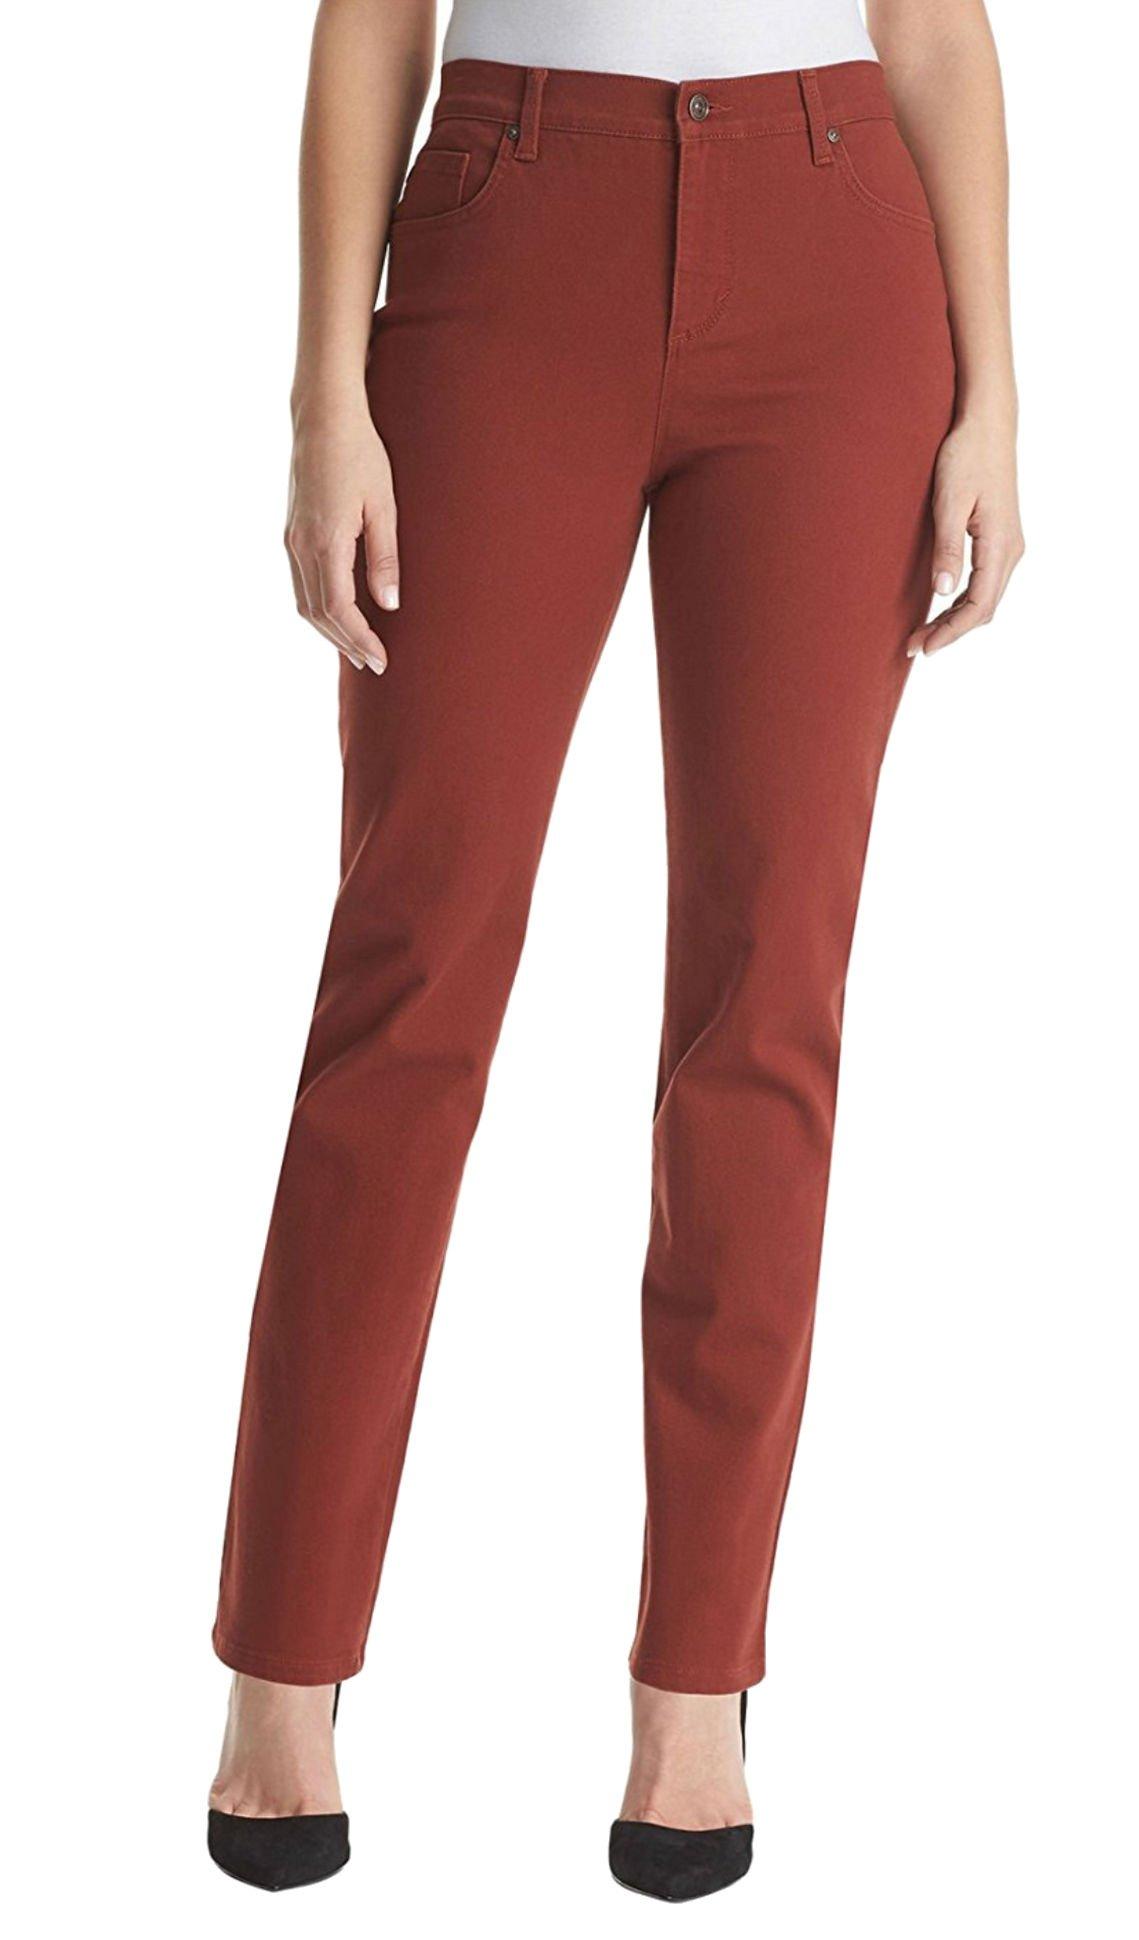 Gloria Vanderbilt Women's Amanda Short Colored Denim Jeans (14P, Roasted Chestnut)